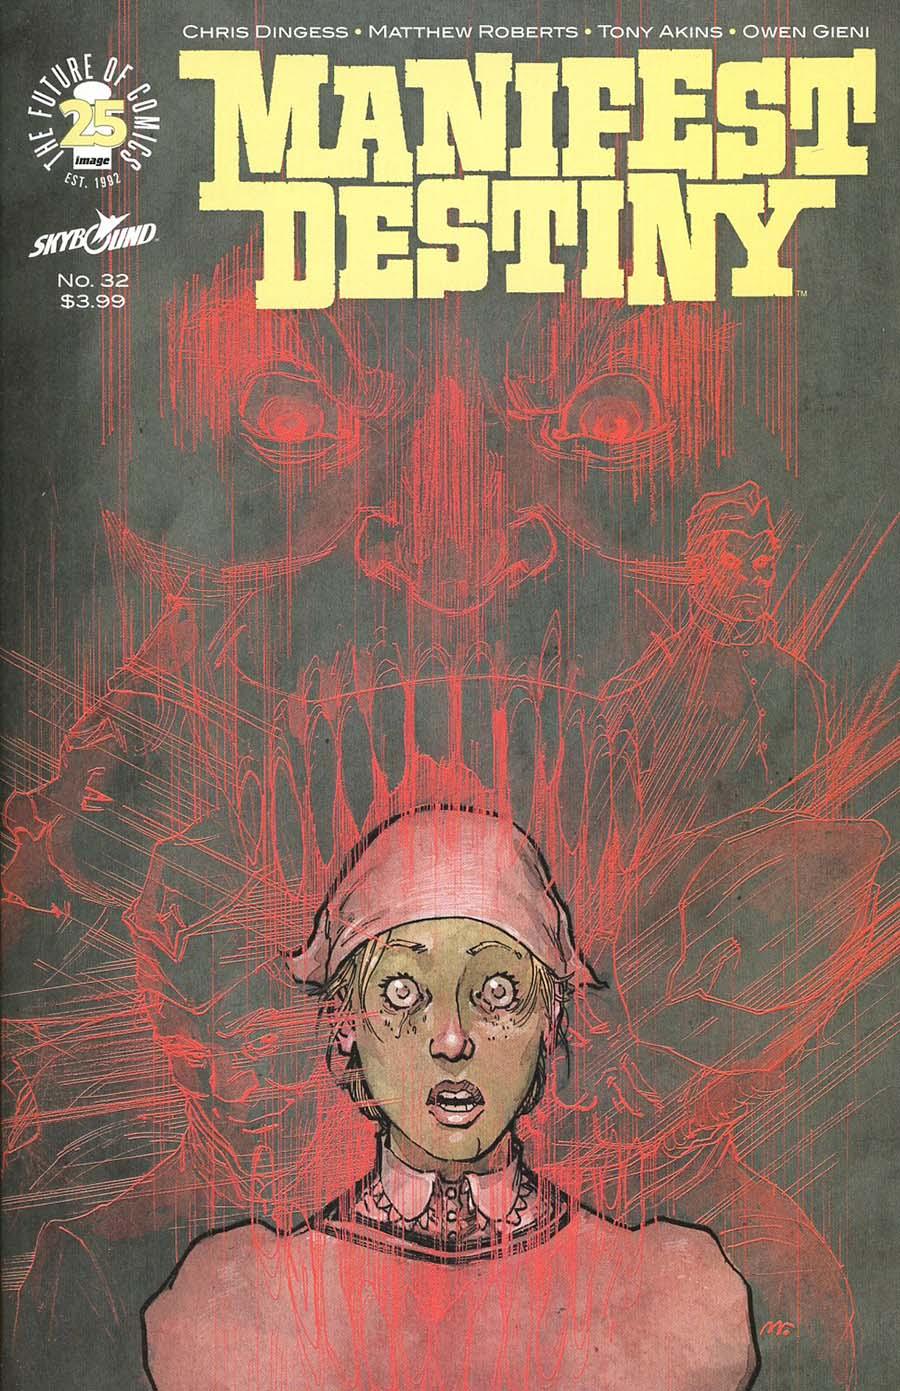 Manifest Destiny #32 Cover A Regular Matthew Roberts & Owen Gieni Cover